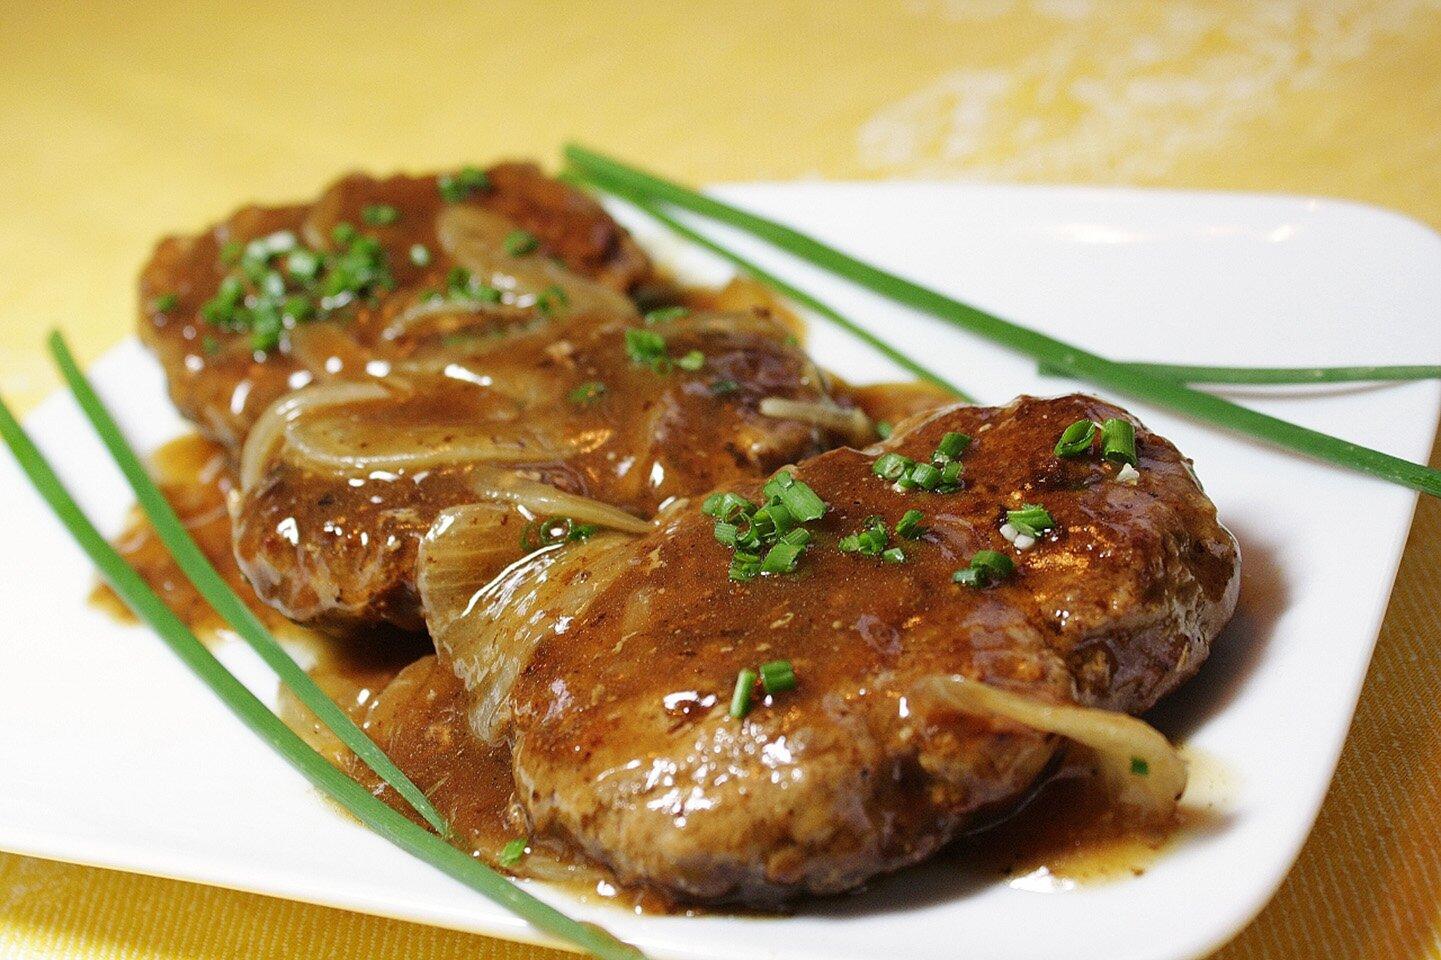 Hamburger Steak With Onions And Gravy Recipe Allrecipes